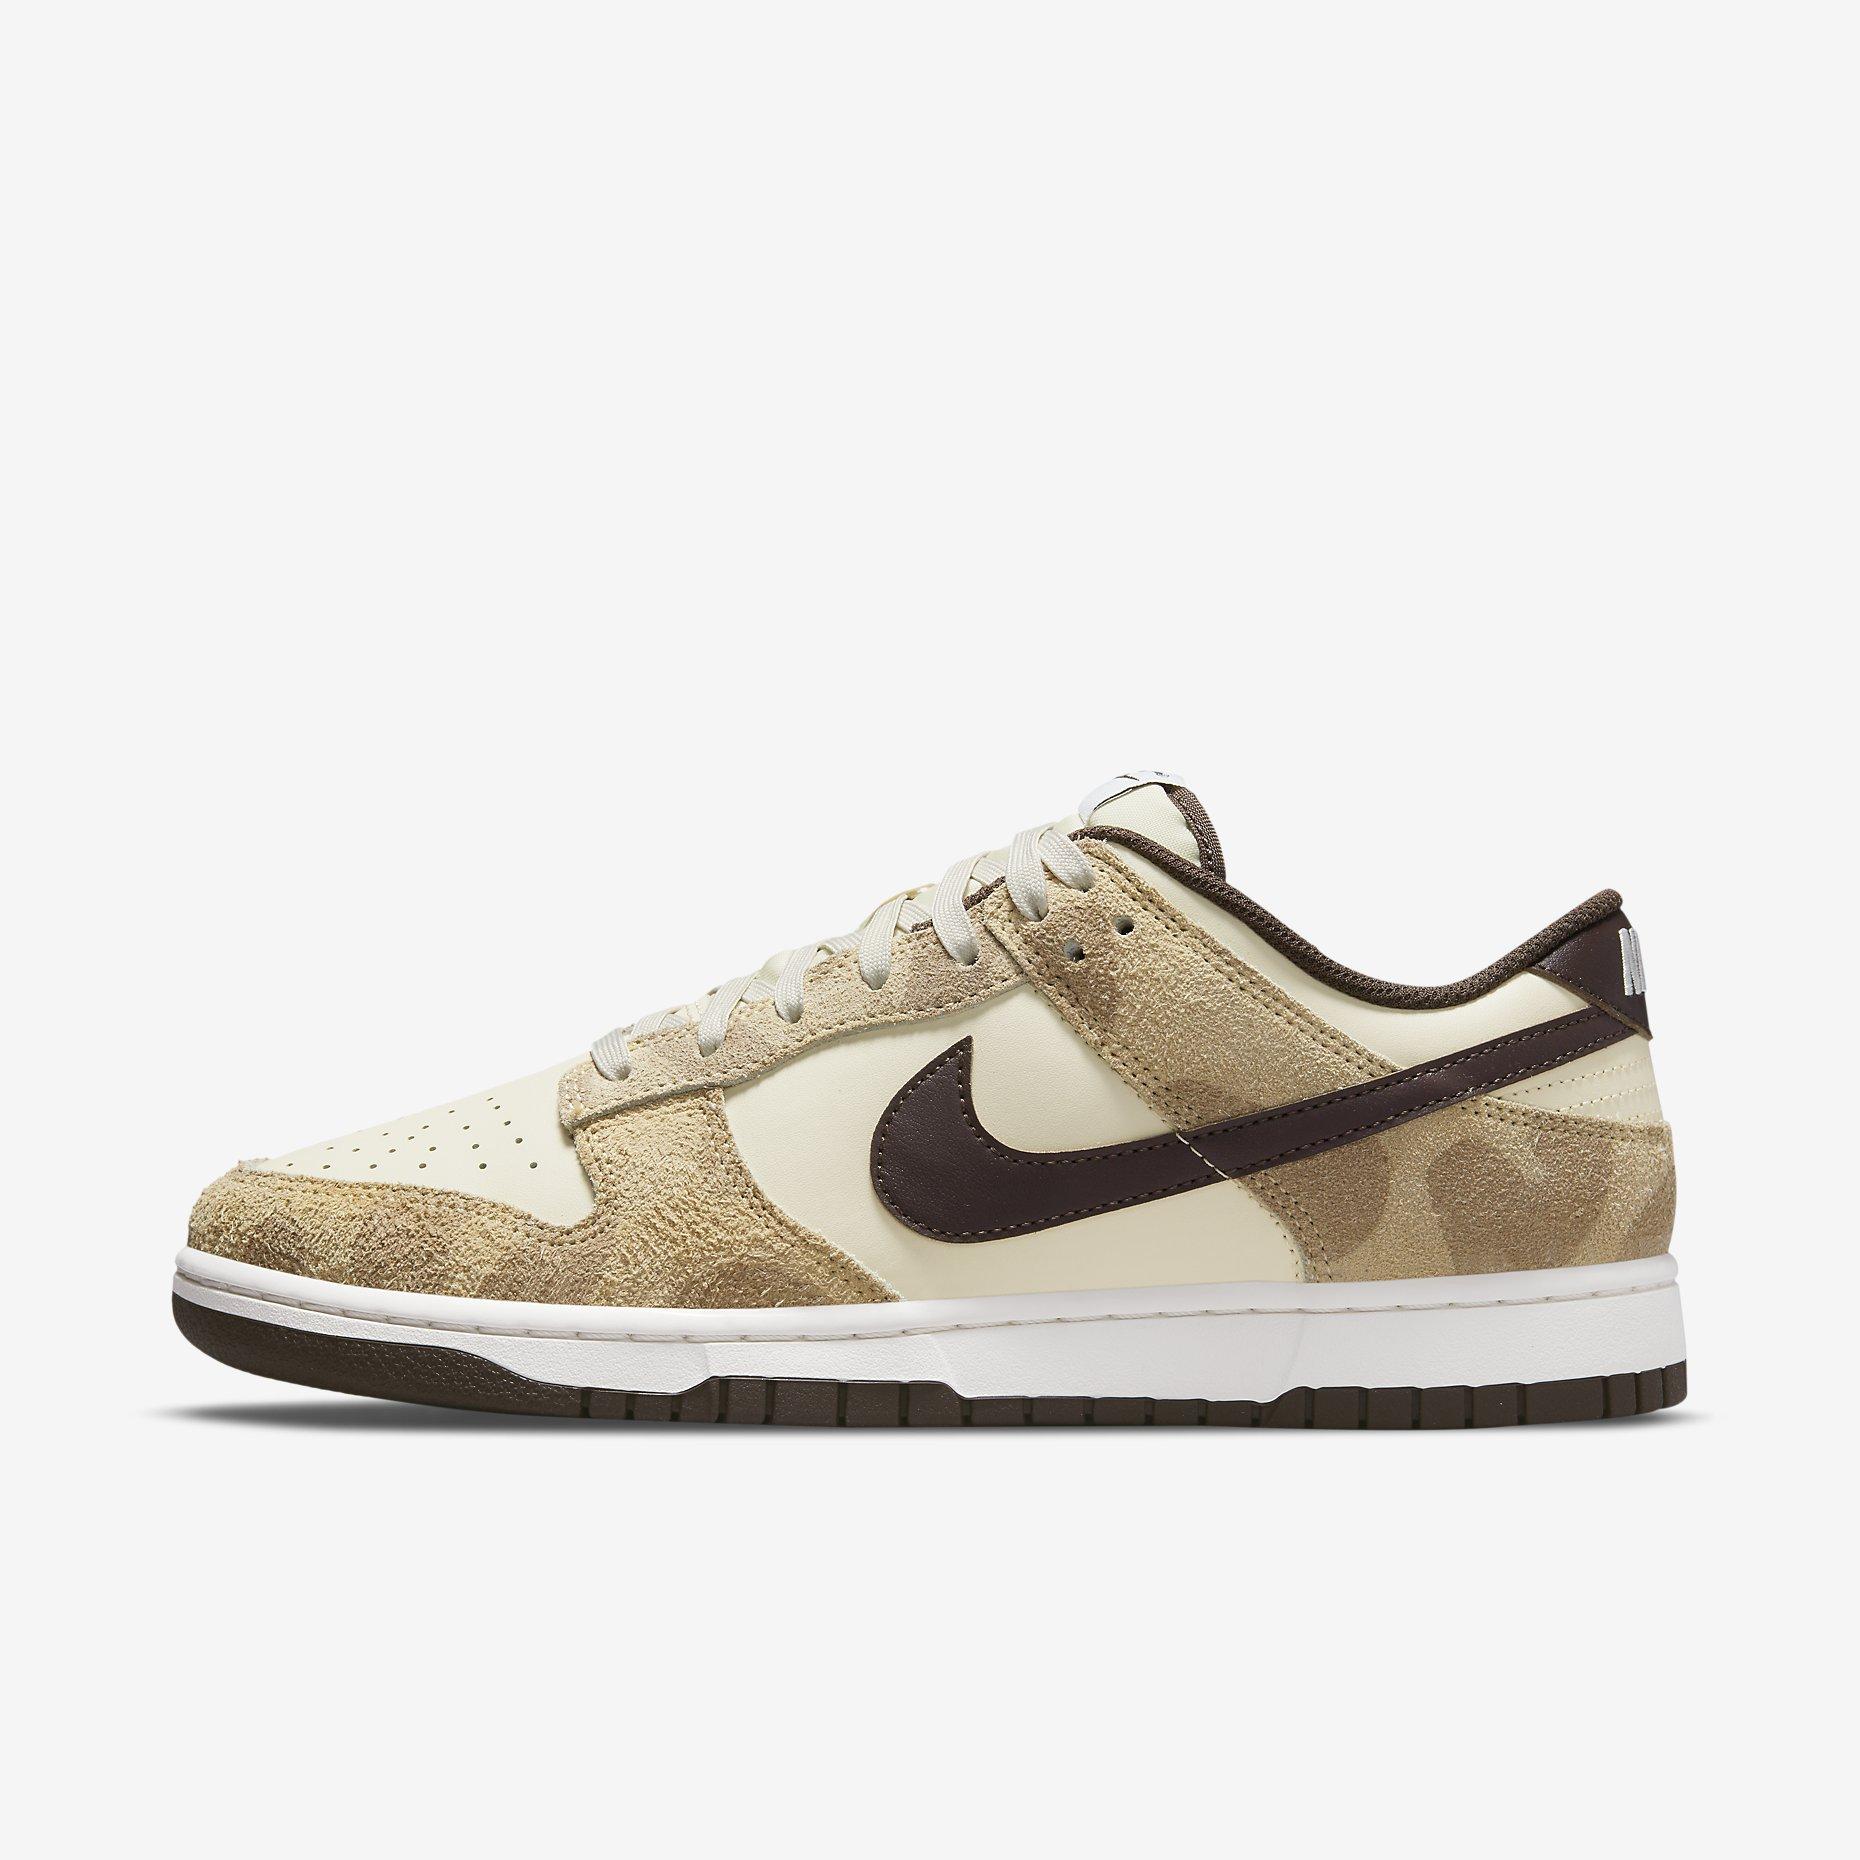 Nike Dunk Low Retro PRM 'Cheetah'}